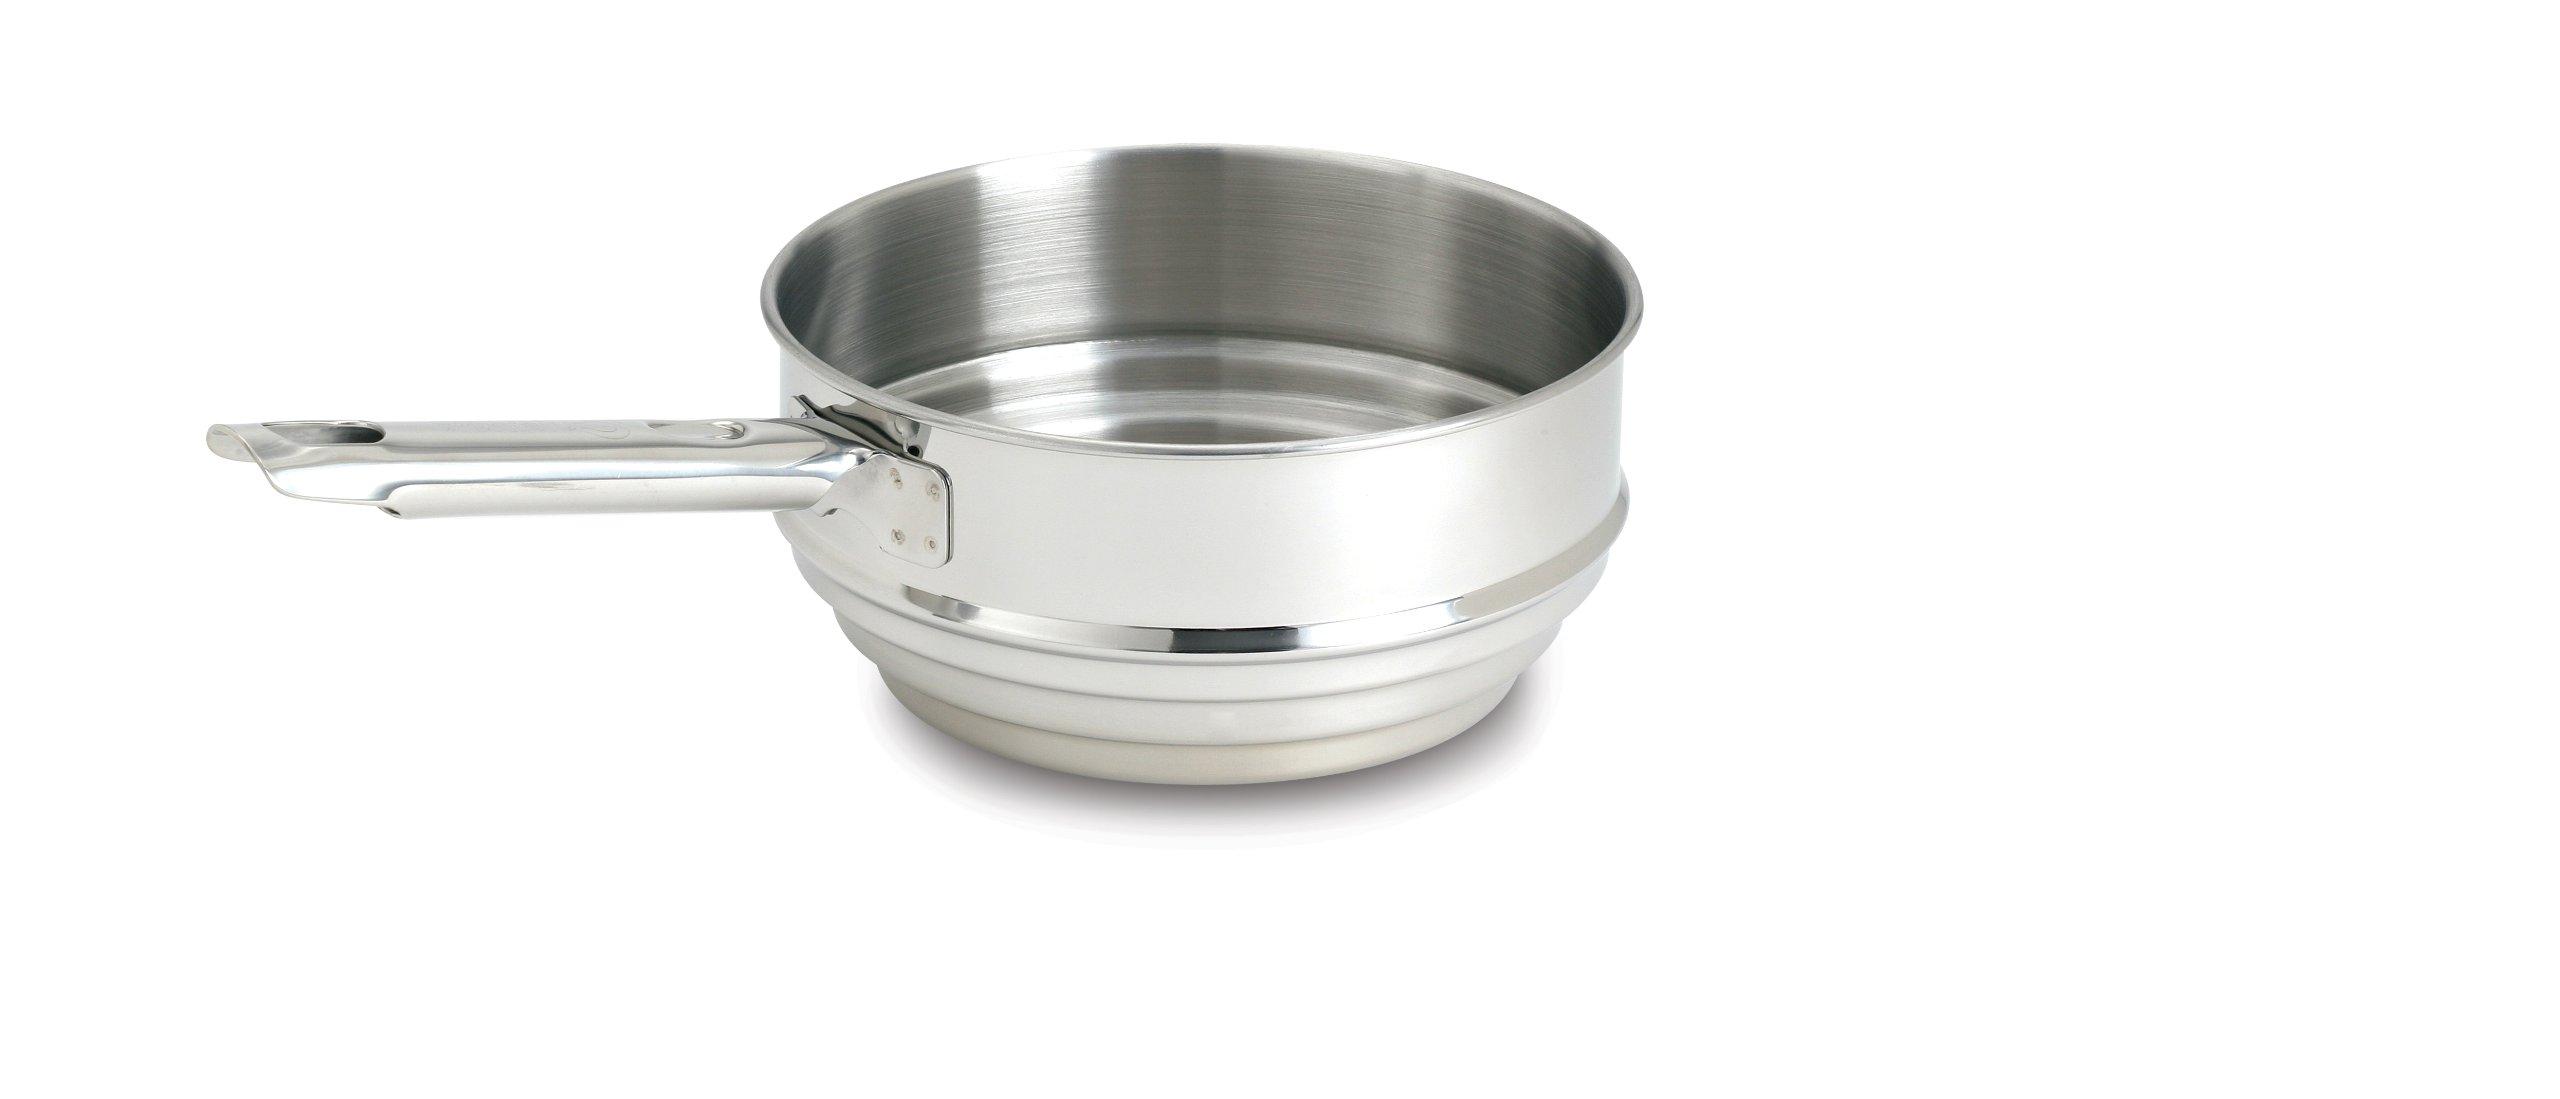 Cuisinox Gourmet 3.6 Quart Universal Double Boiler Insert